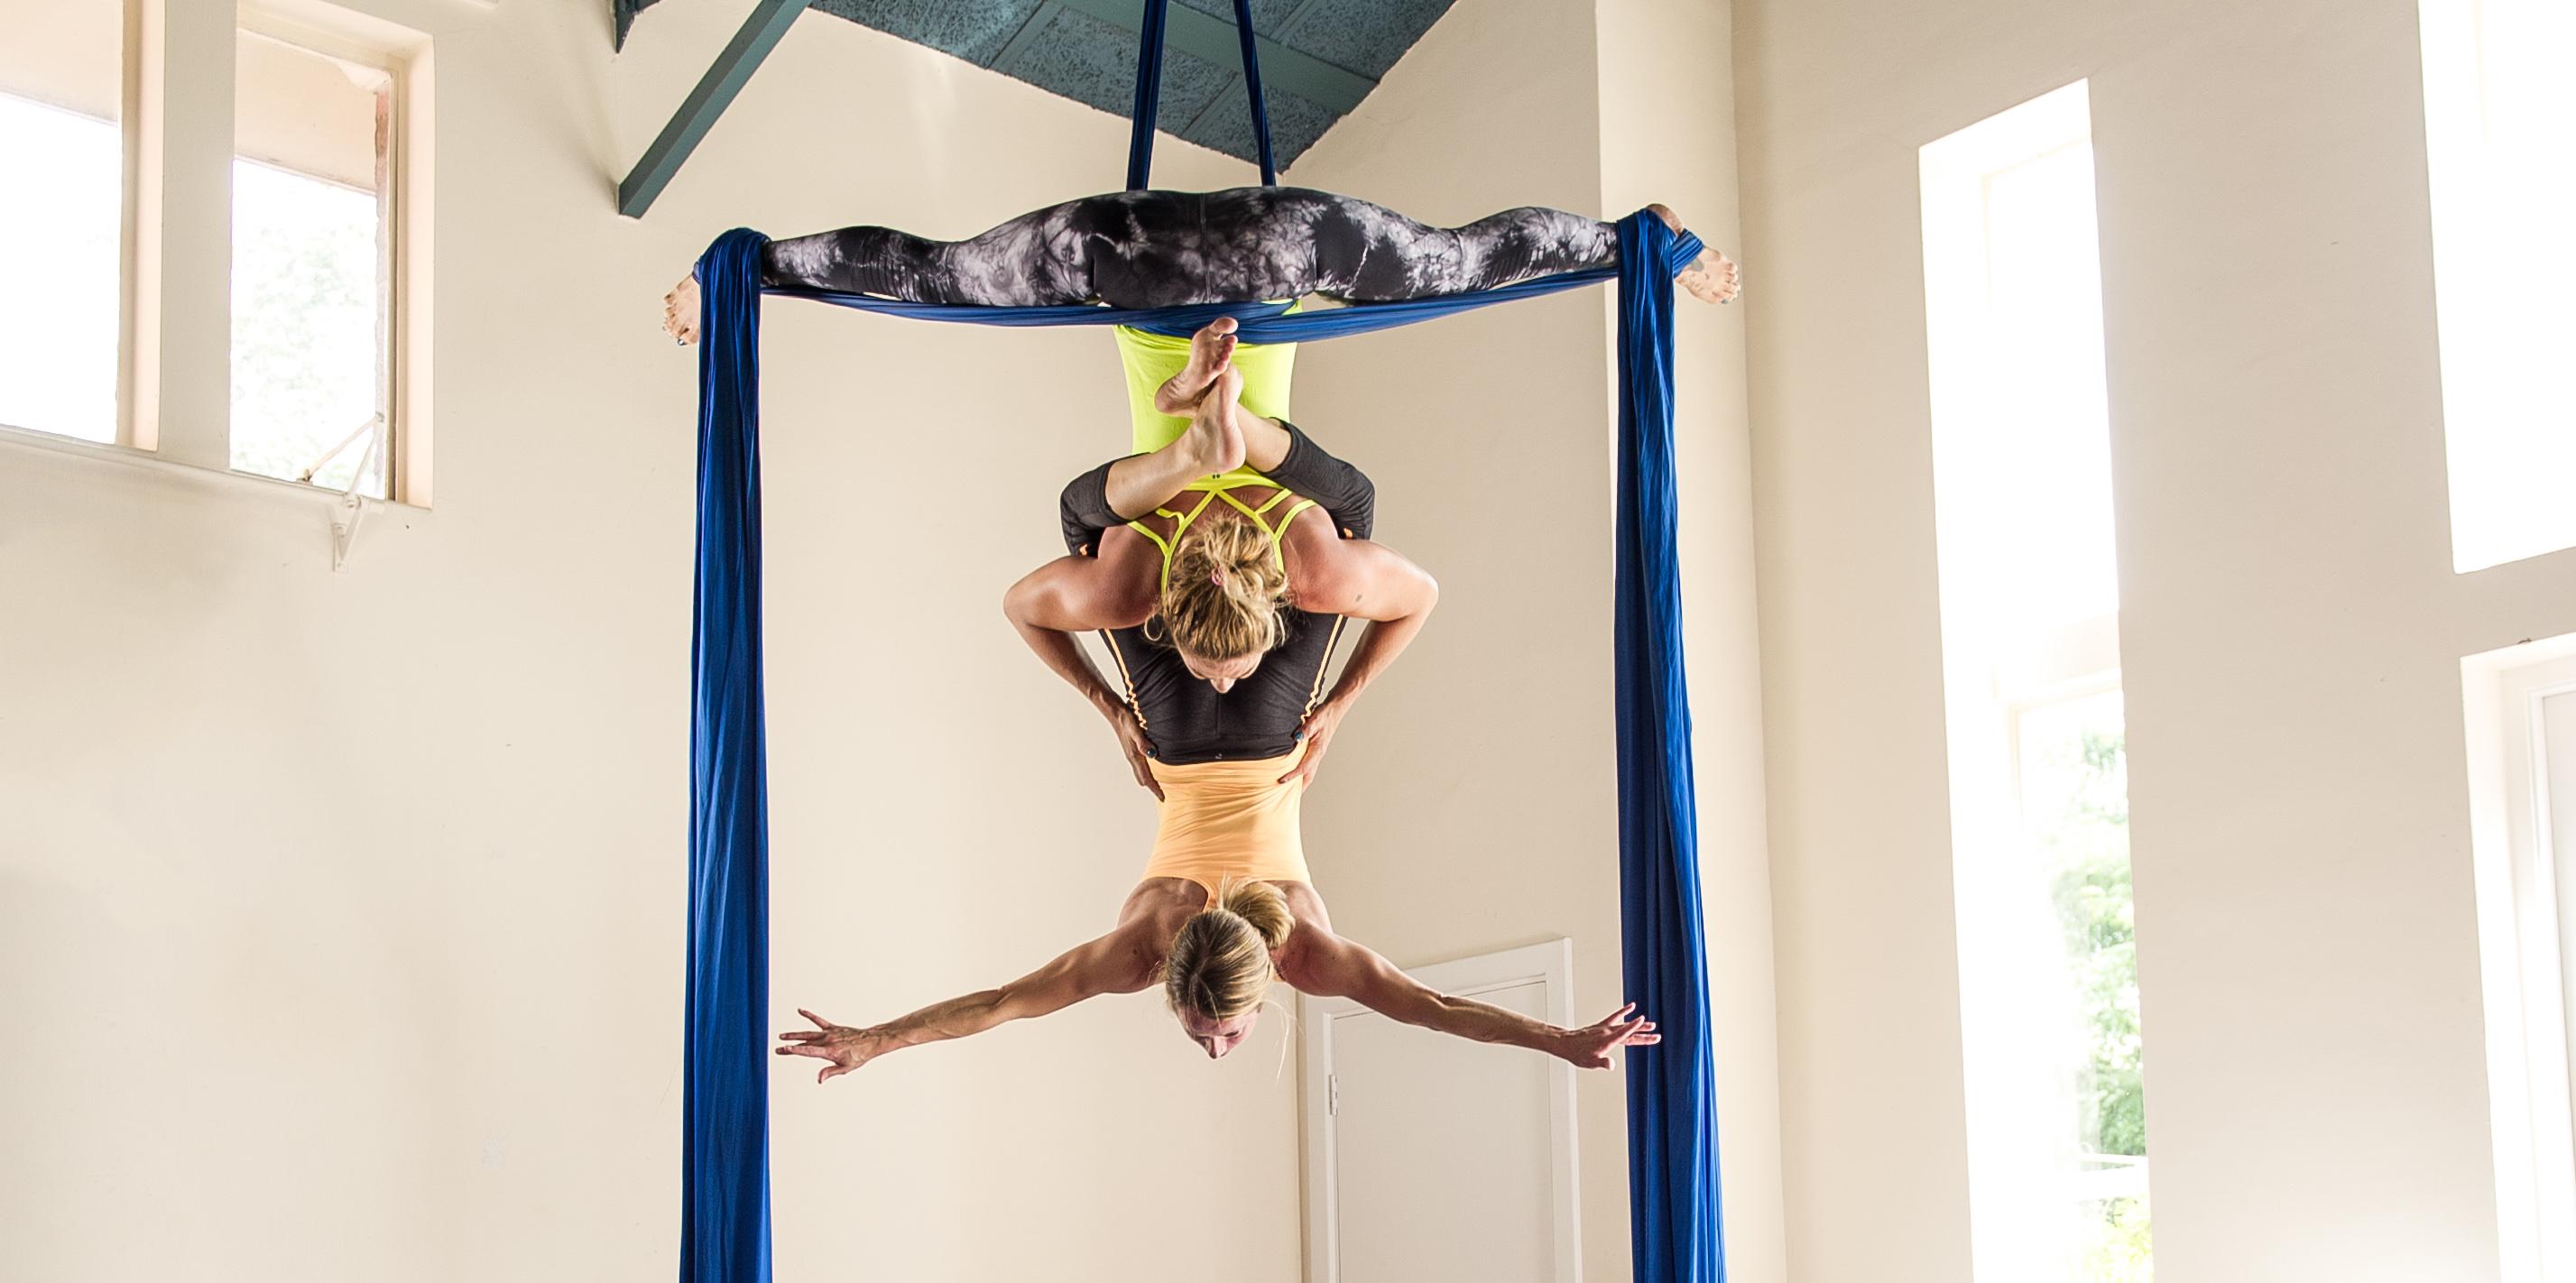 Aerial Silks Classes London Flying Fantastic